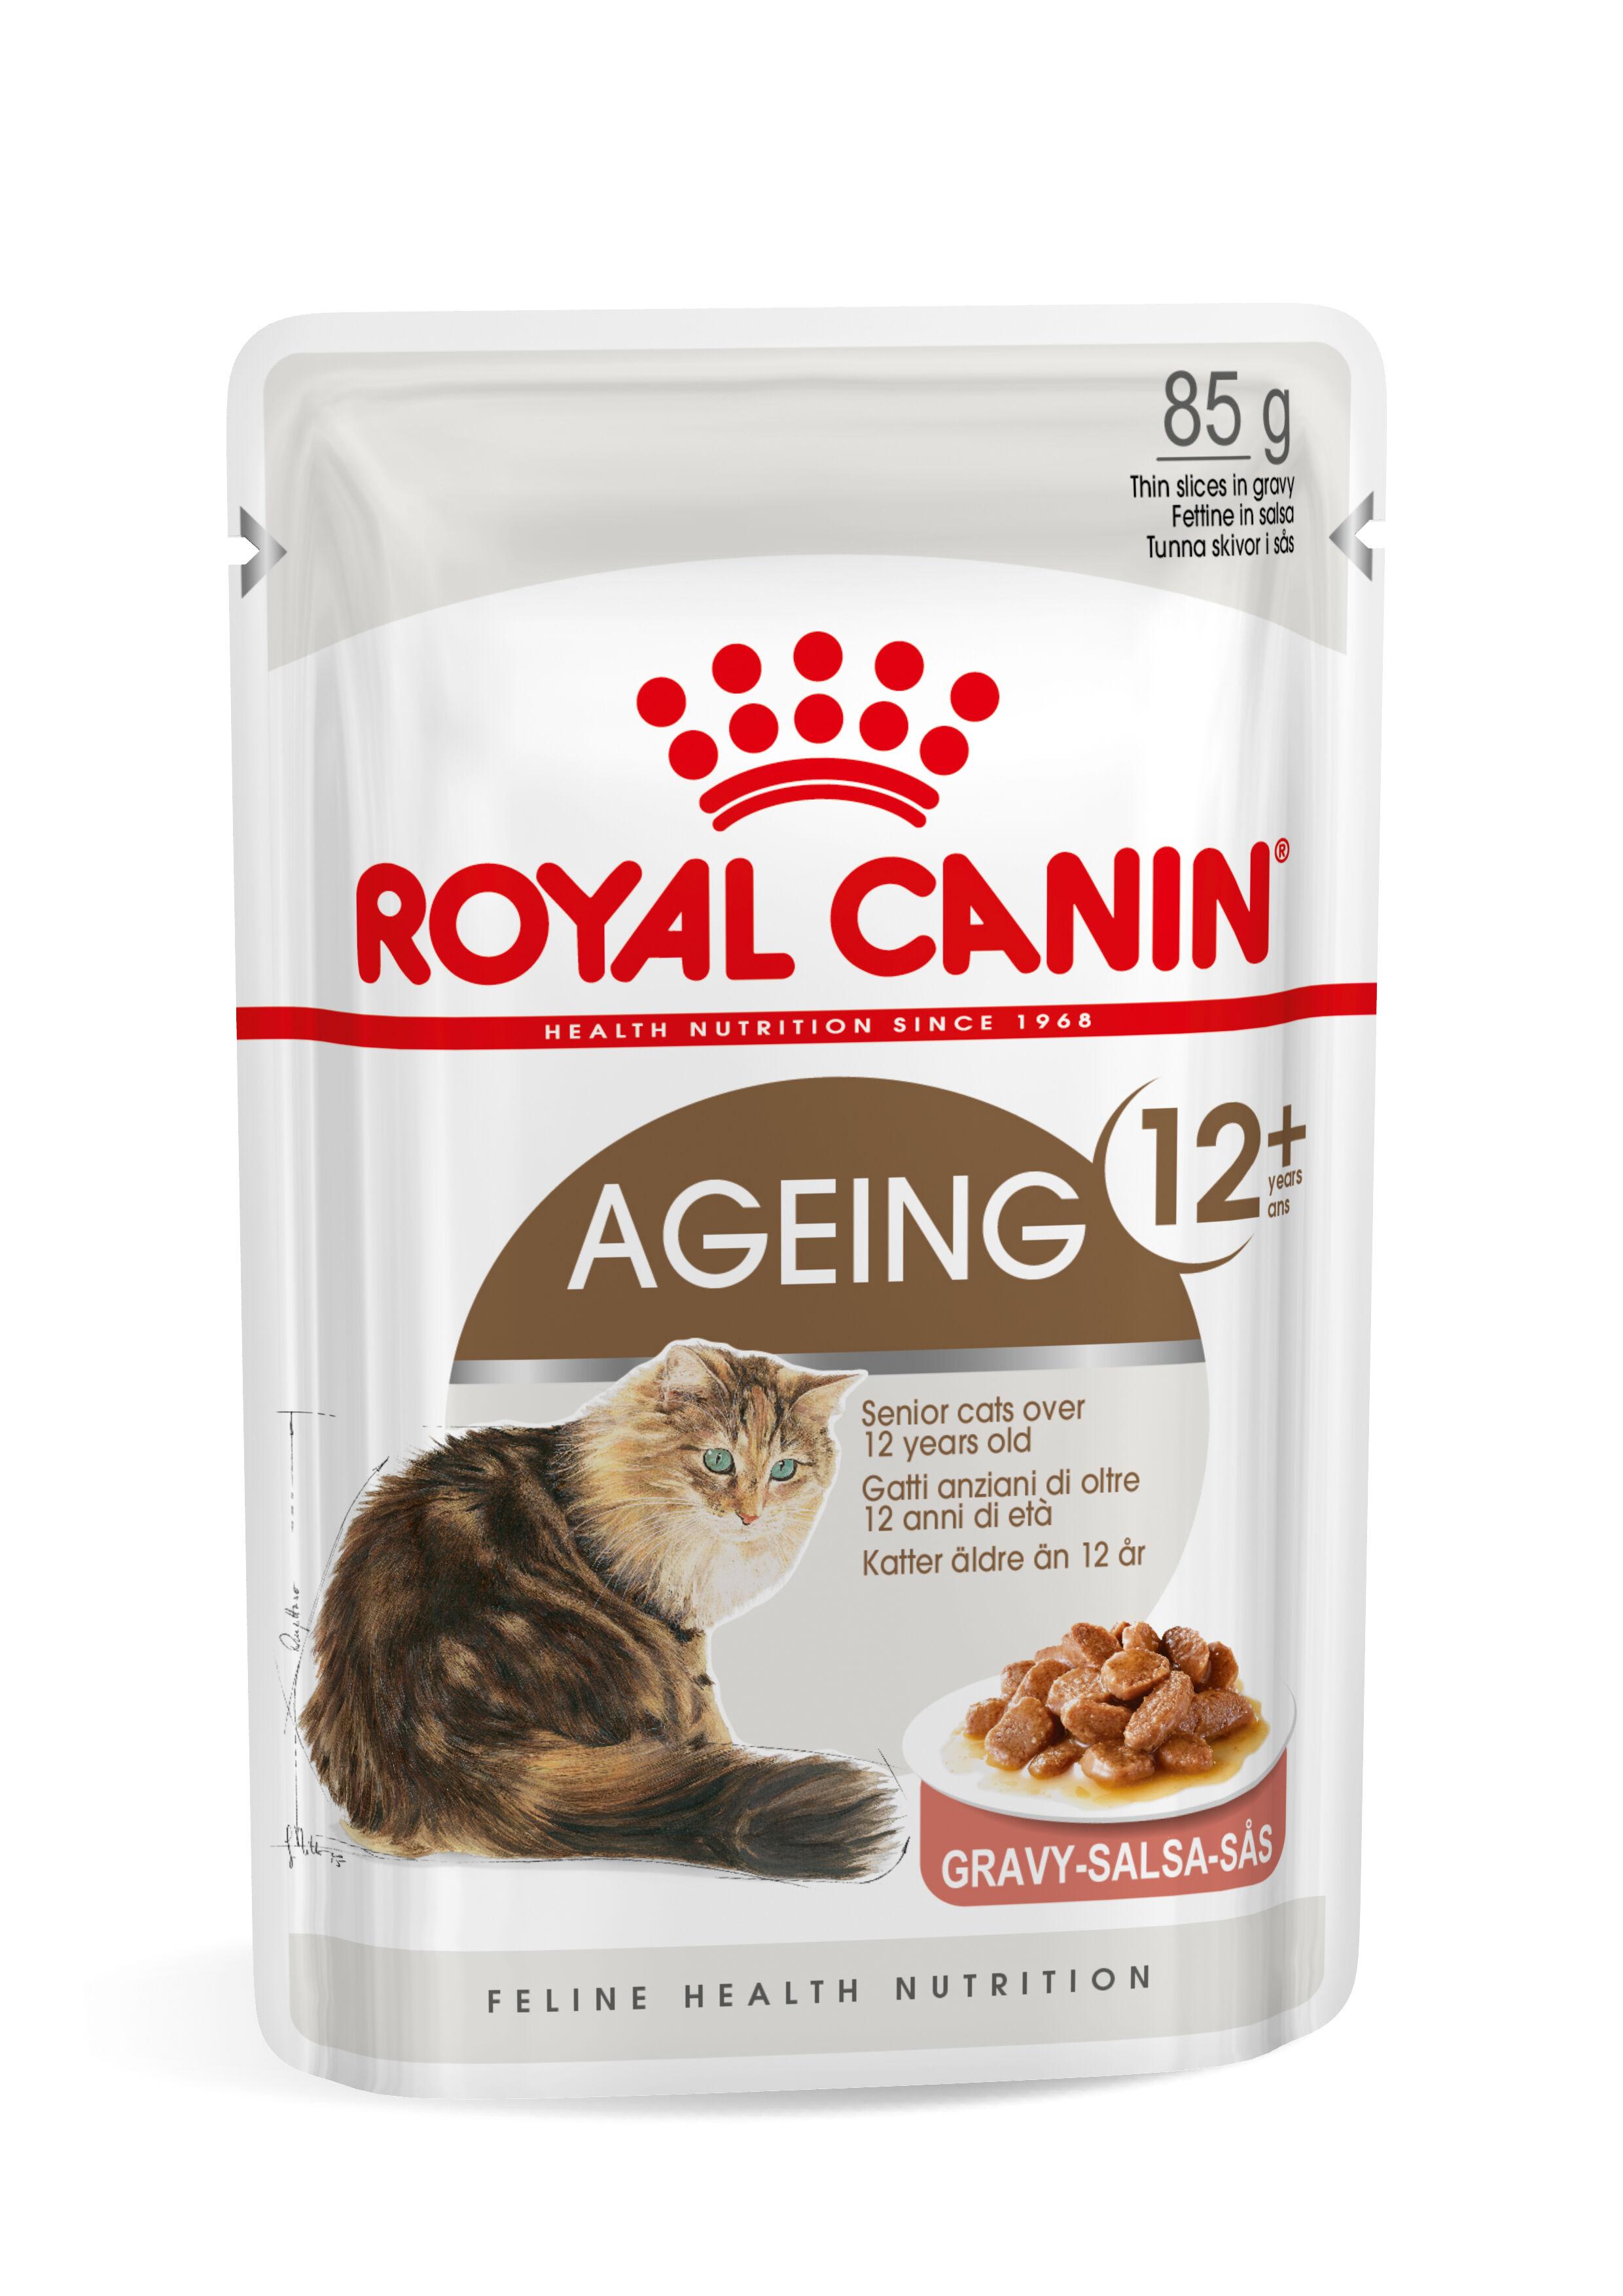 Royal Canin Ageing 12+ pour chat x12 sachets 1x Sauce + 1x Gelée (24x85 gr)